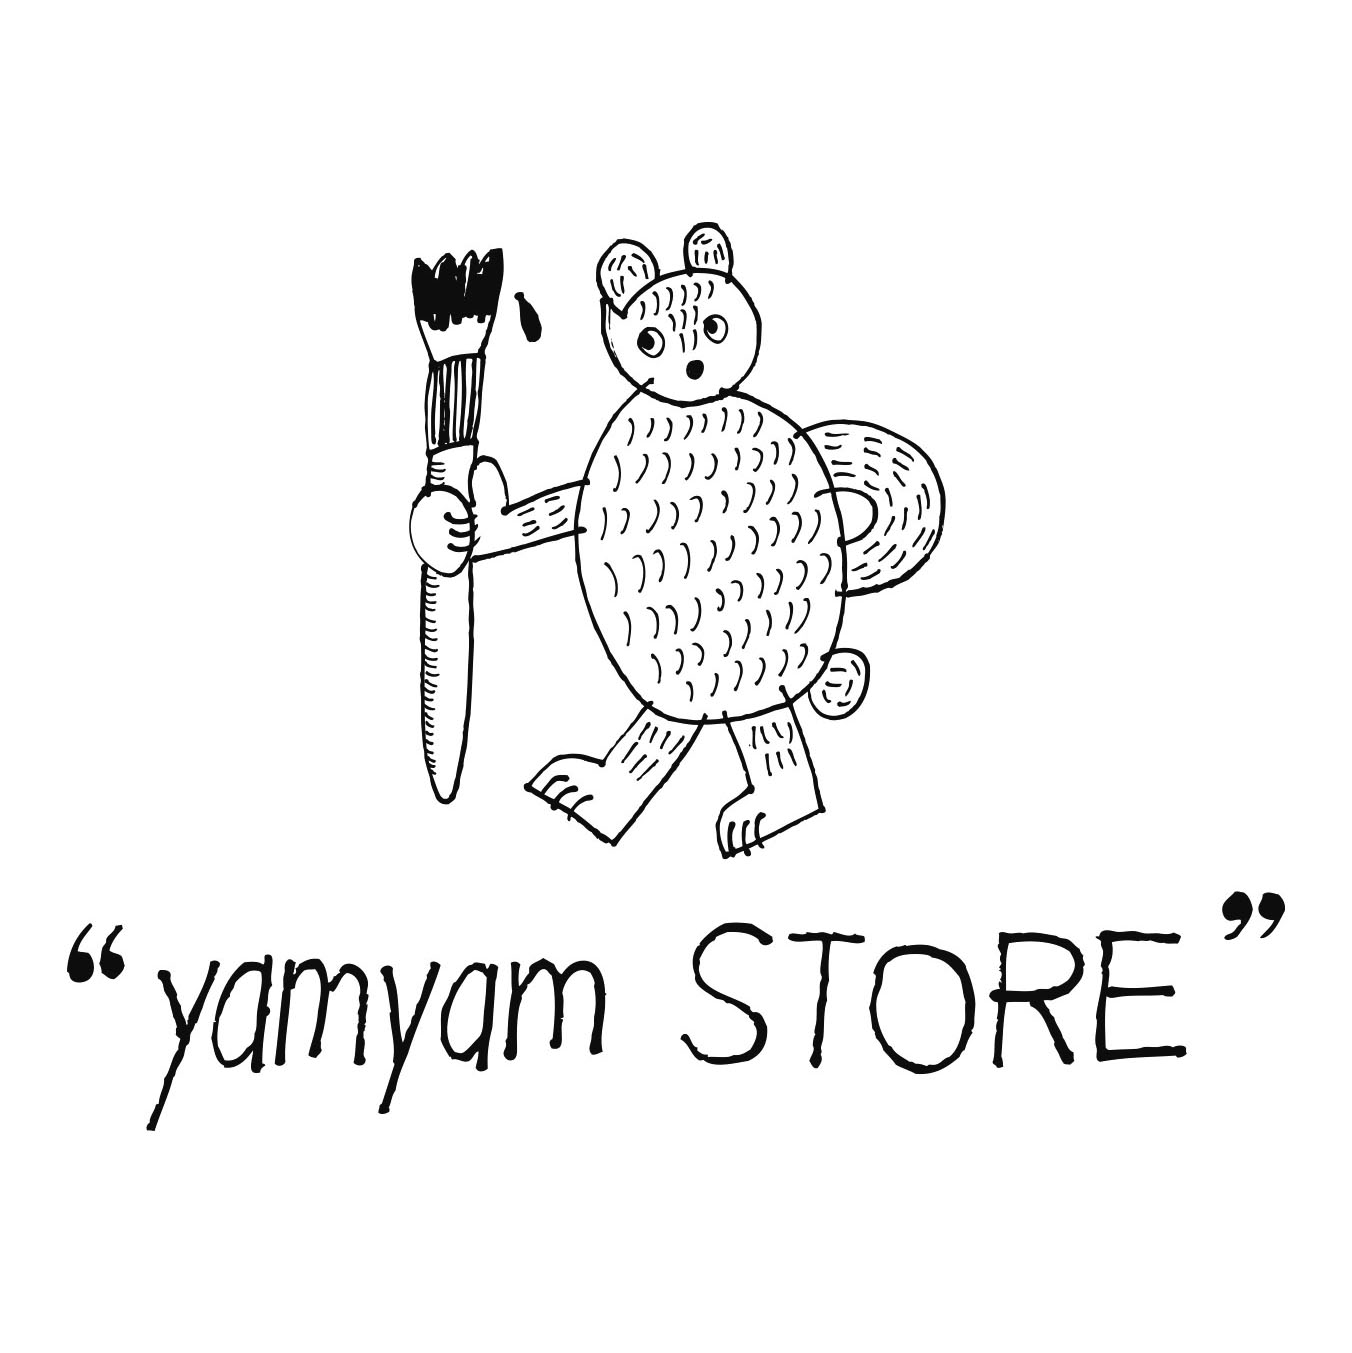 yamyamSTOREmark_square